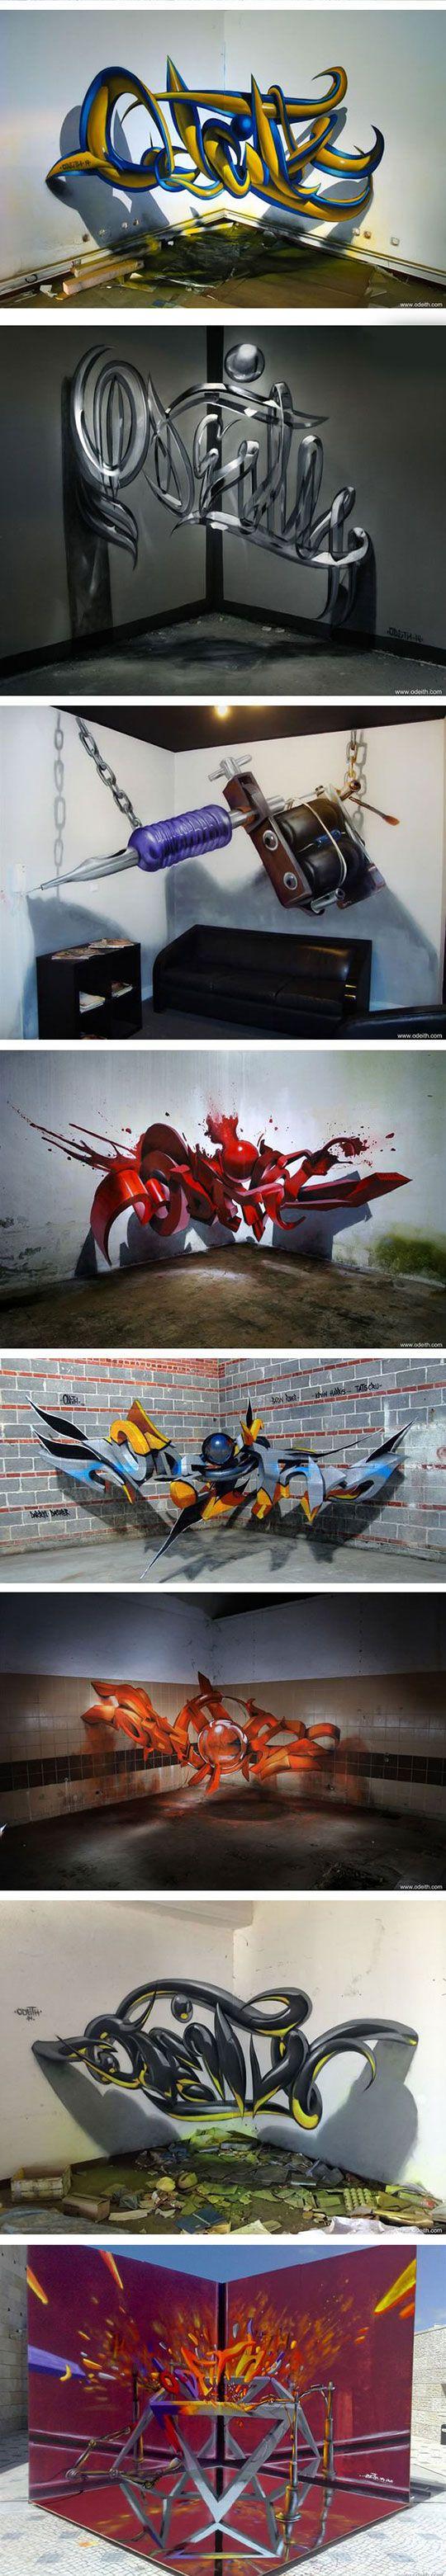 Portuguese Street Artist Creates Stunning 3D Graffiti That Seems To Float In The…   – Street – Art